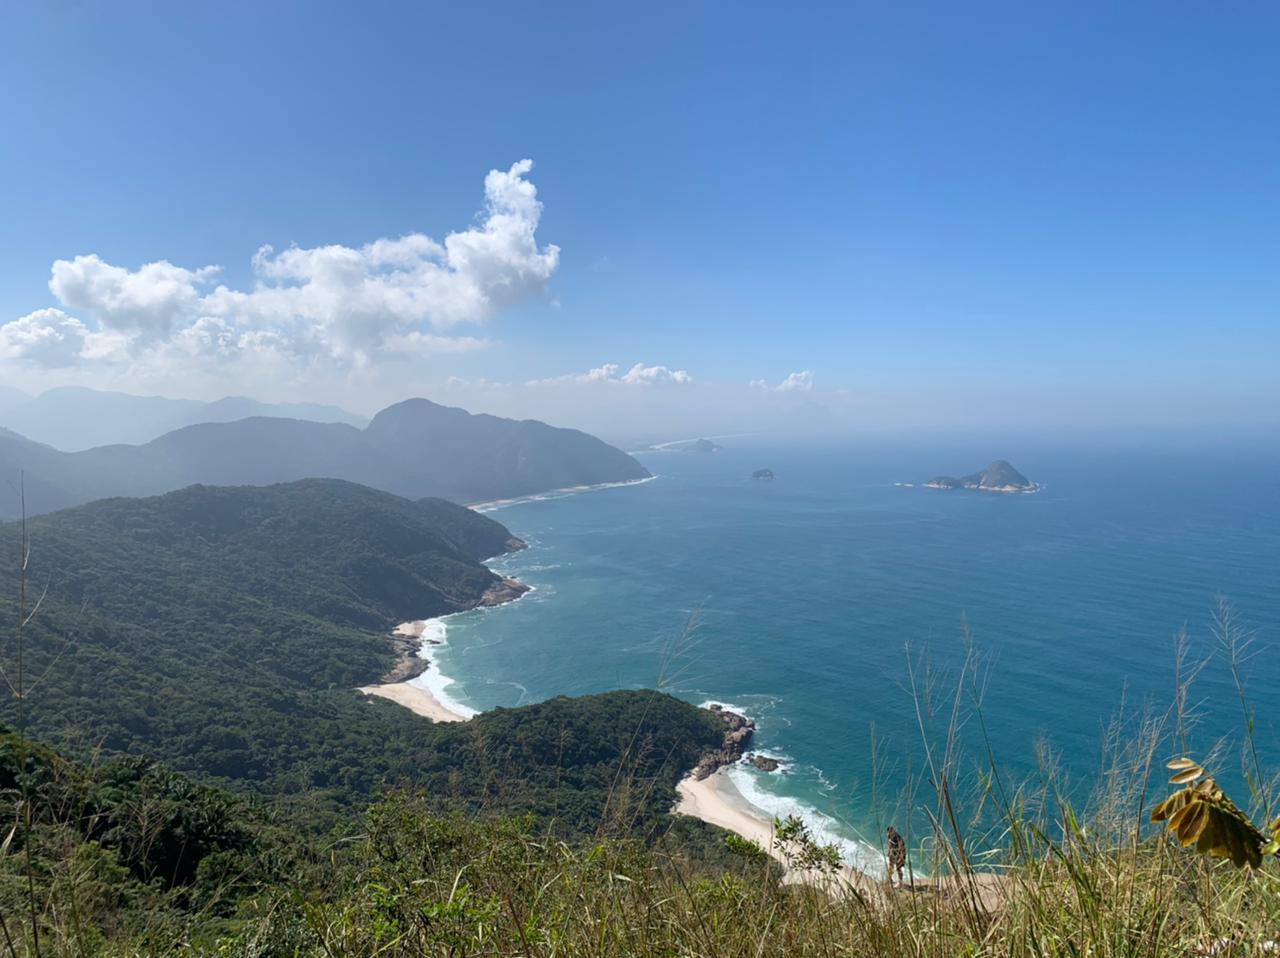 Vista da pedra do Urubu